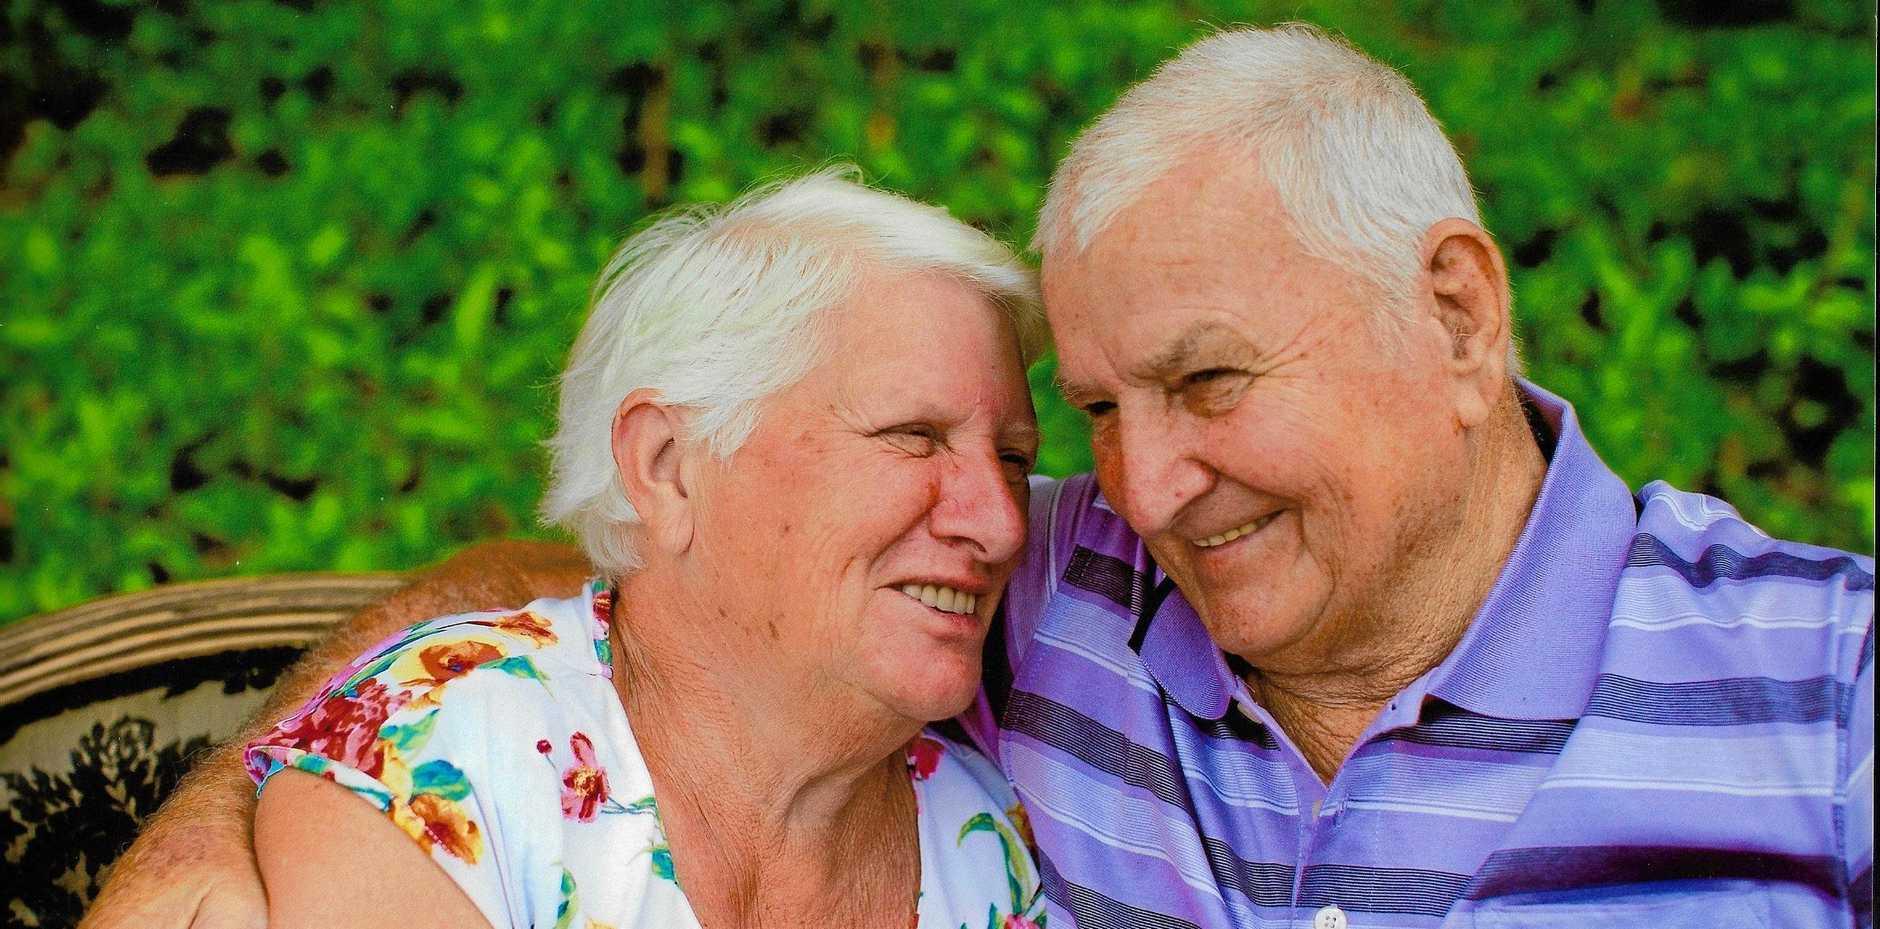 Nambour life members Ann and Bert Deschamps. The couple rarely spent time apart.